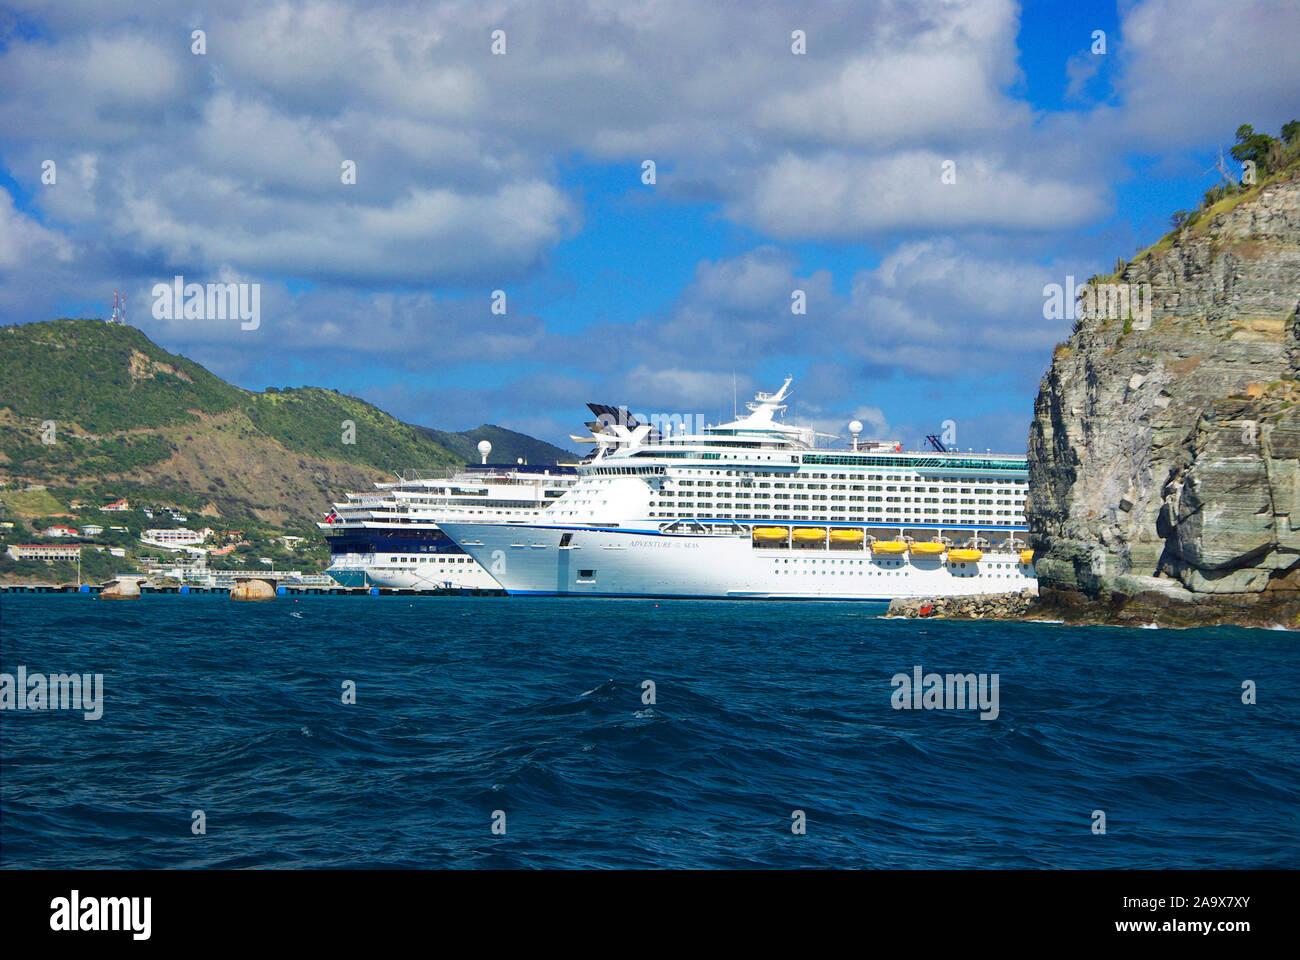 Franzoesiche Karibik; Antillen; Sint Maarten; Saint-Martin; Kreuzfahrtschiff Banque D'Images